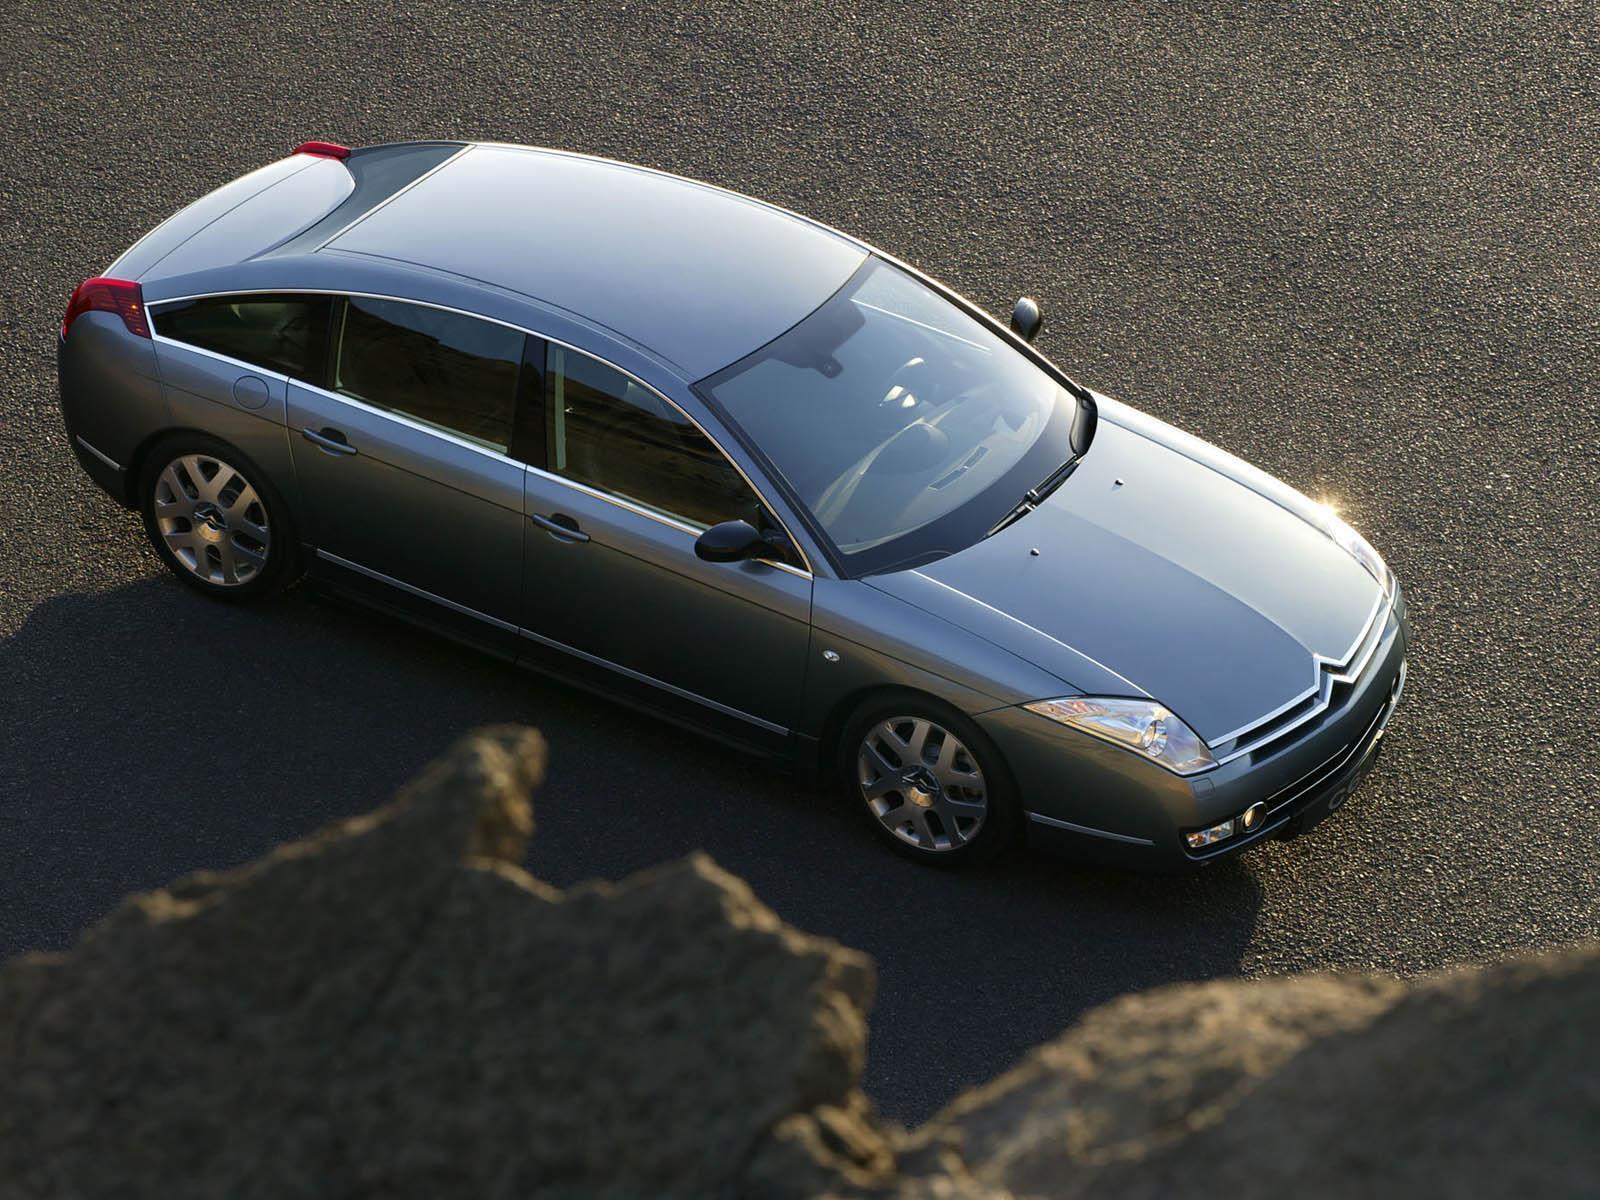 C6 V6 HDI exclusive του 2005, κάτοψη